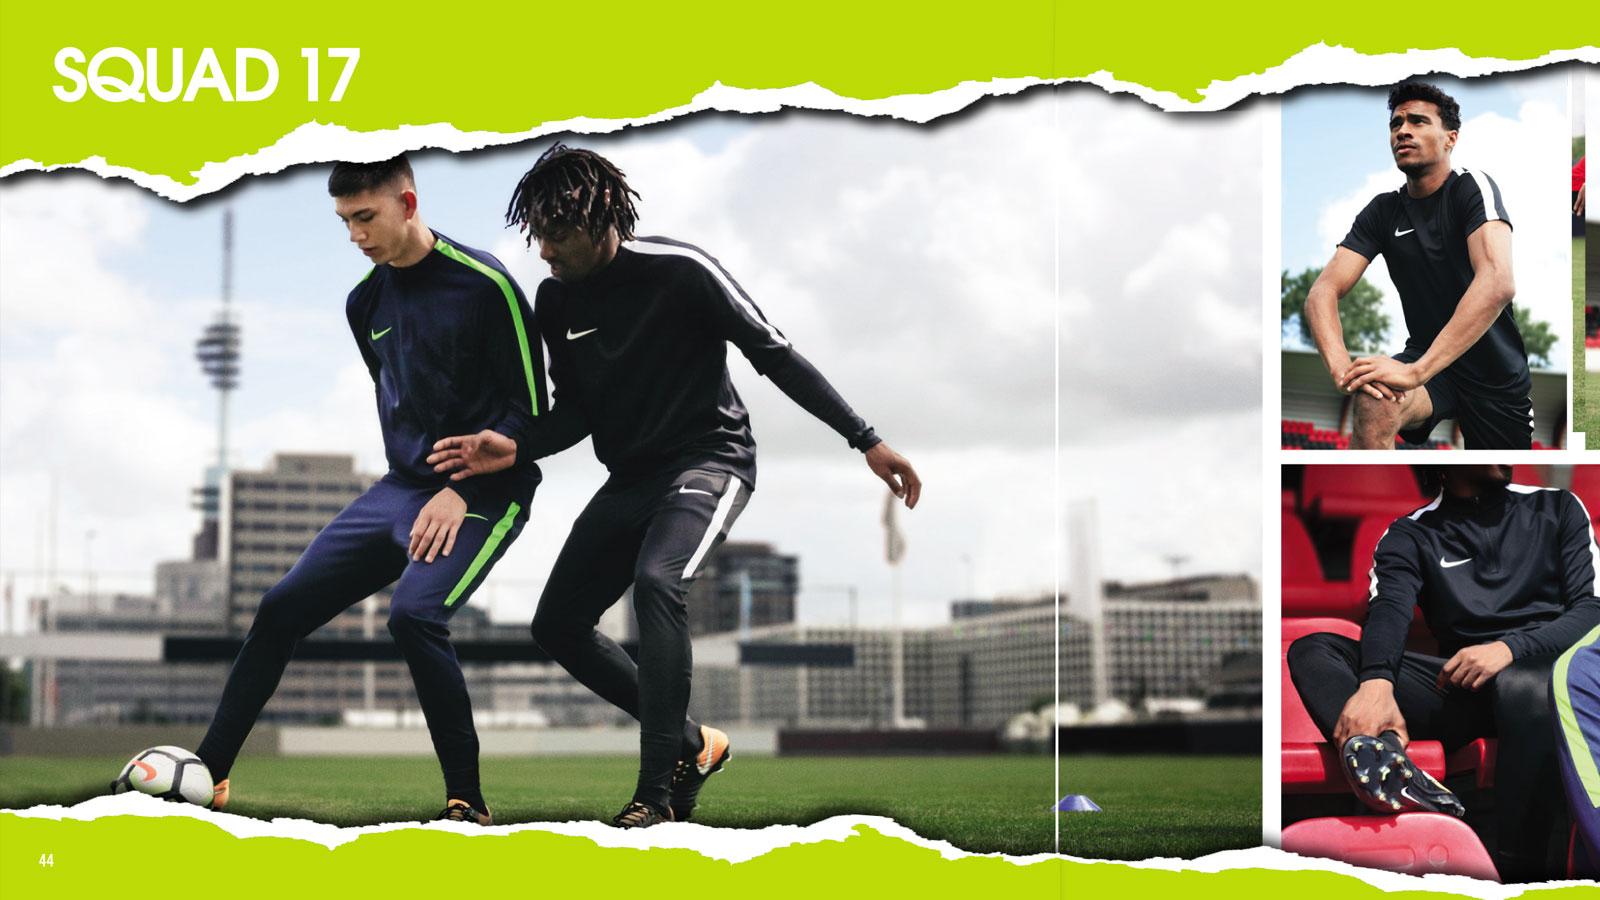 Nike Squad 17 Teamline als Trainingsbekleidung mit Trainingsanzug und Co.